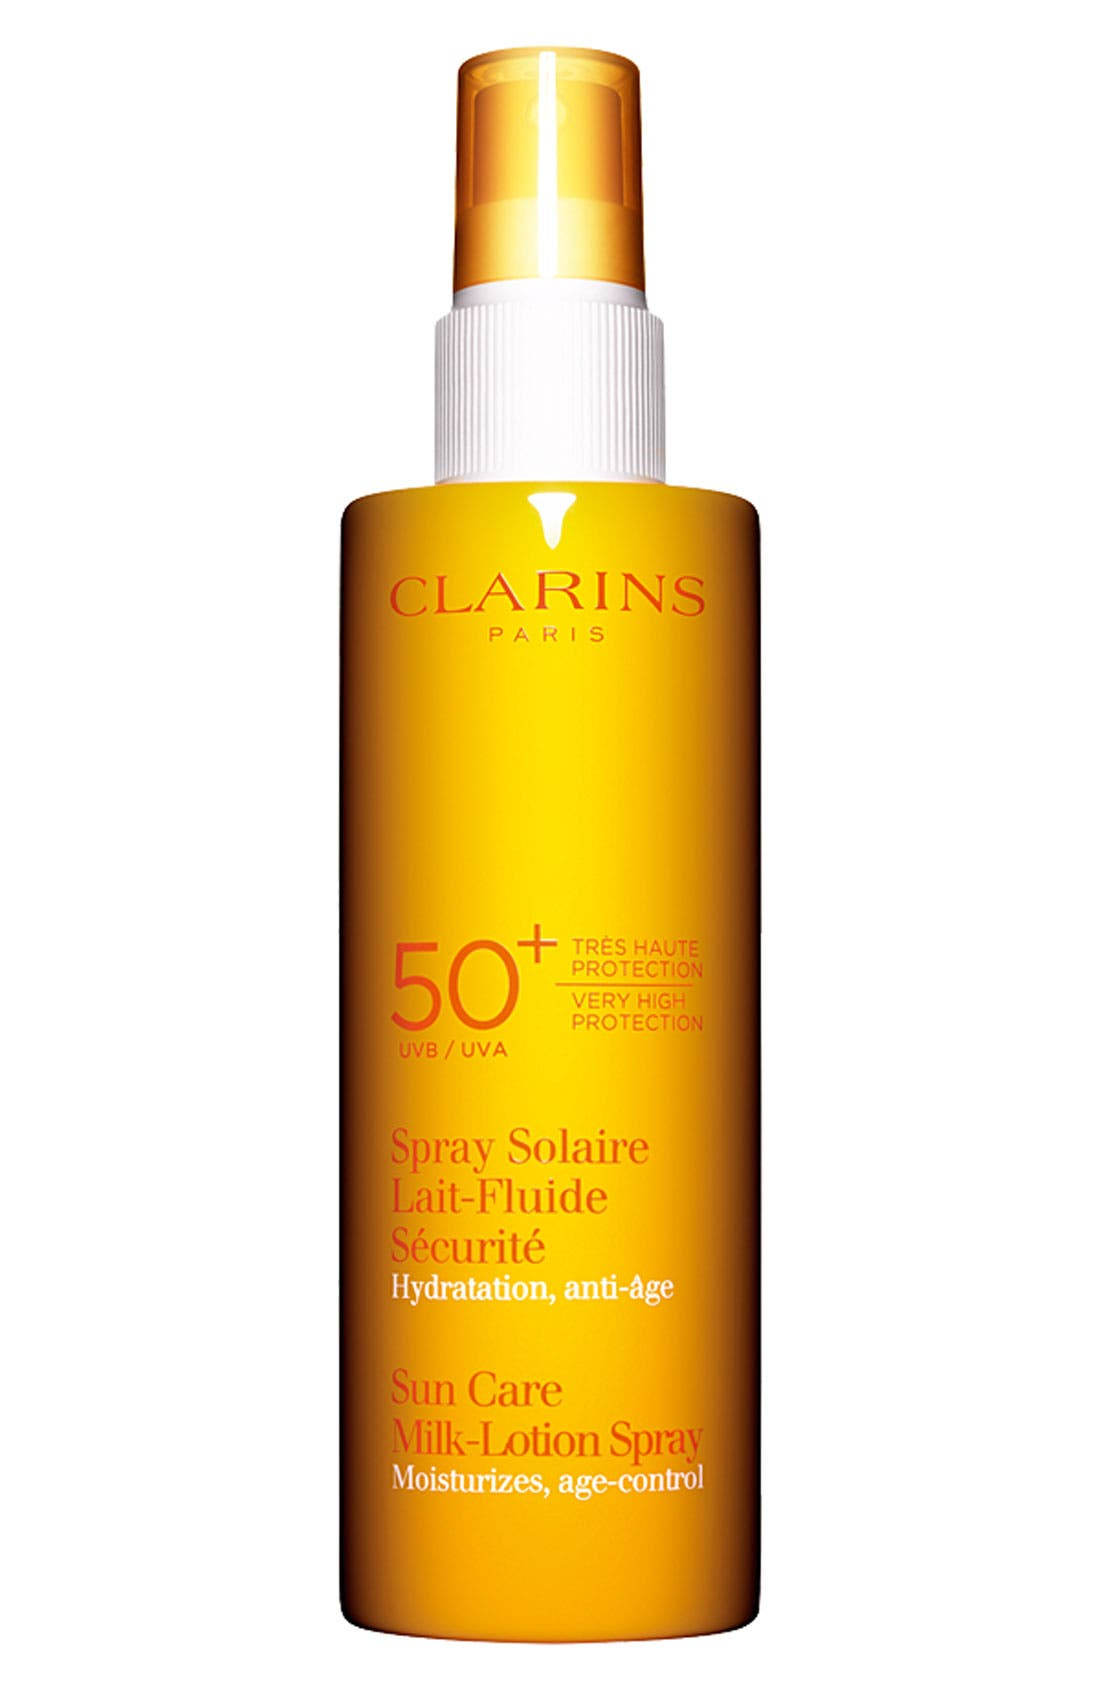 Sun Care Milk-Lotion Spray SPF 50+,                             Main thumbnail 1, color,                             NO COLOR